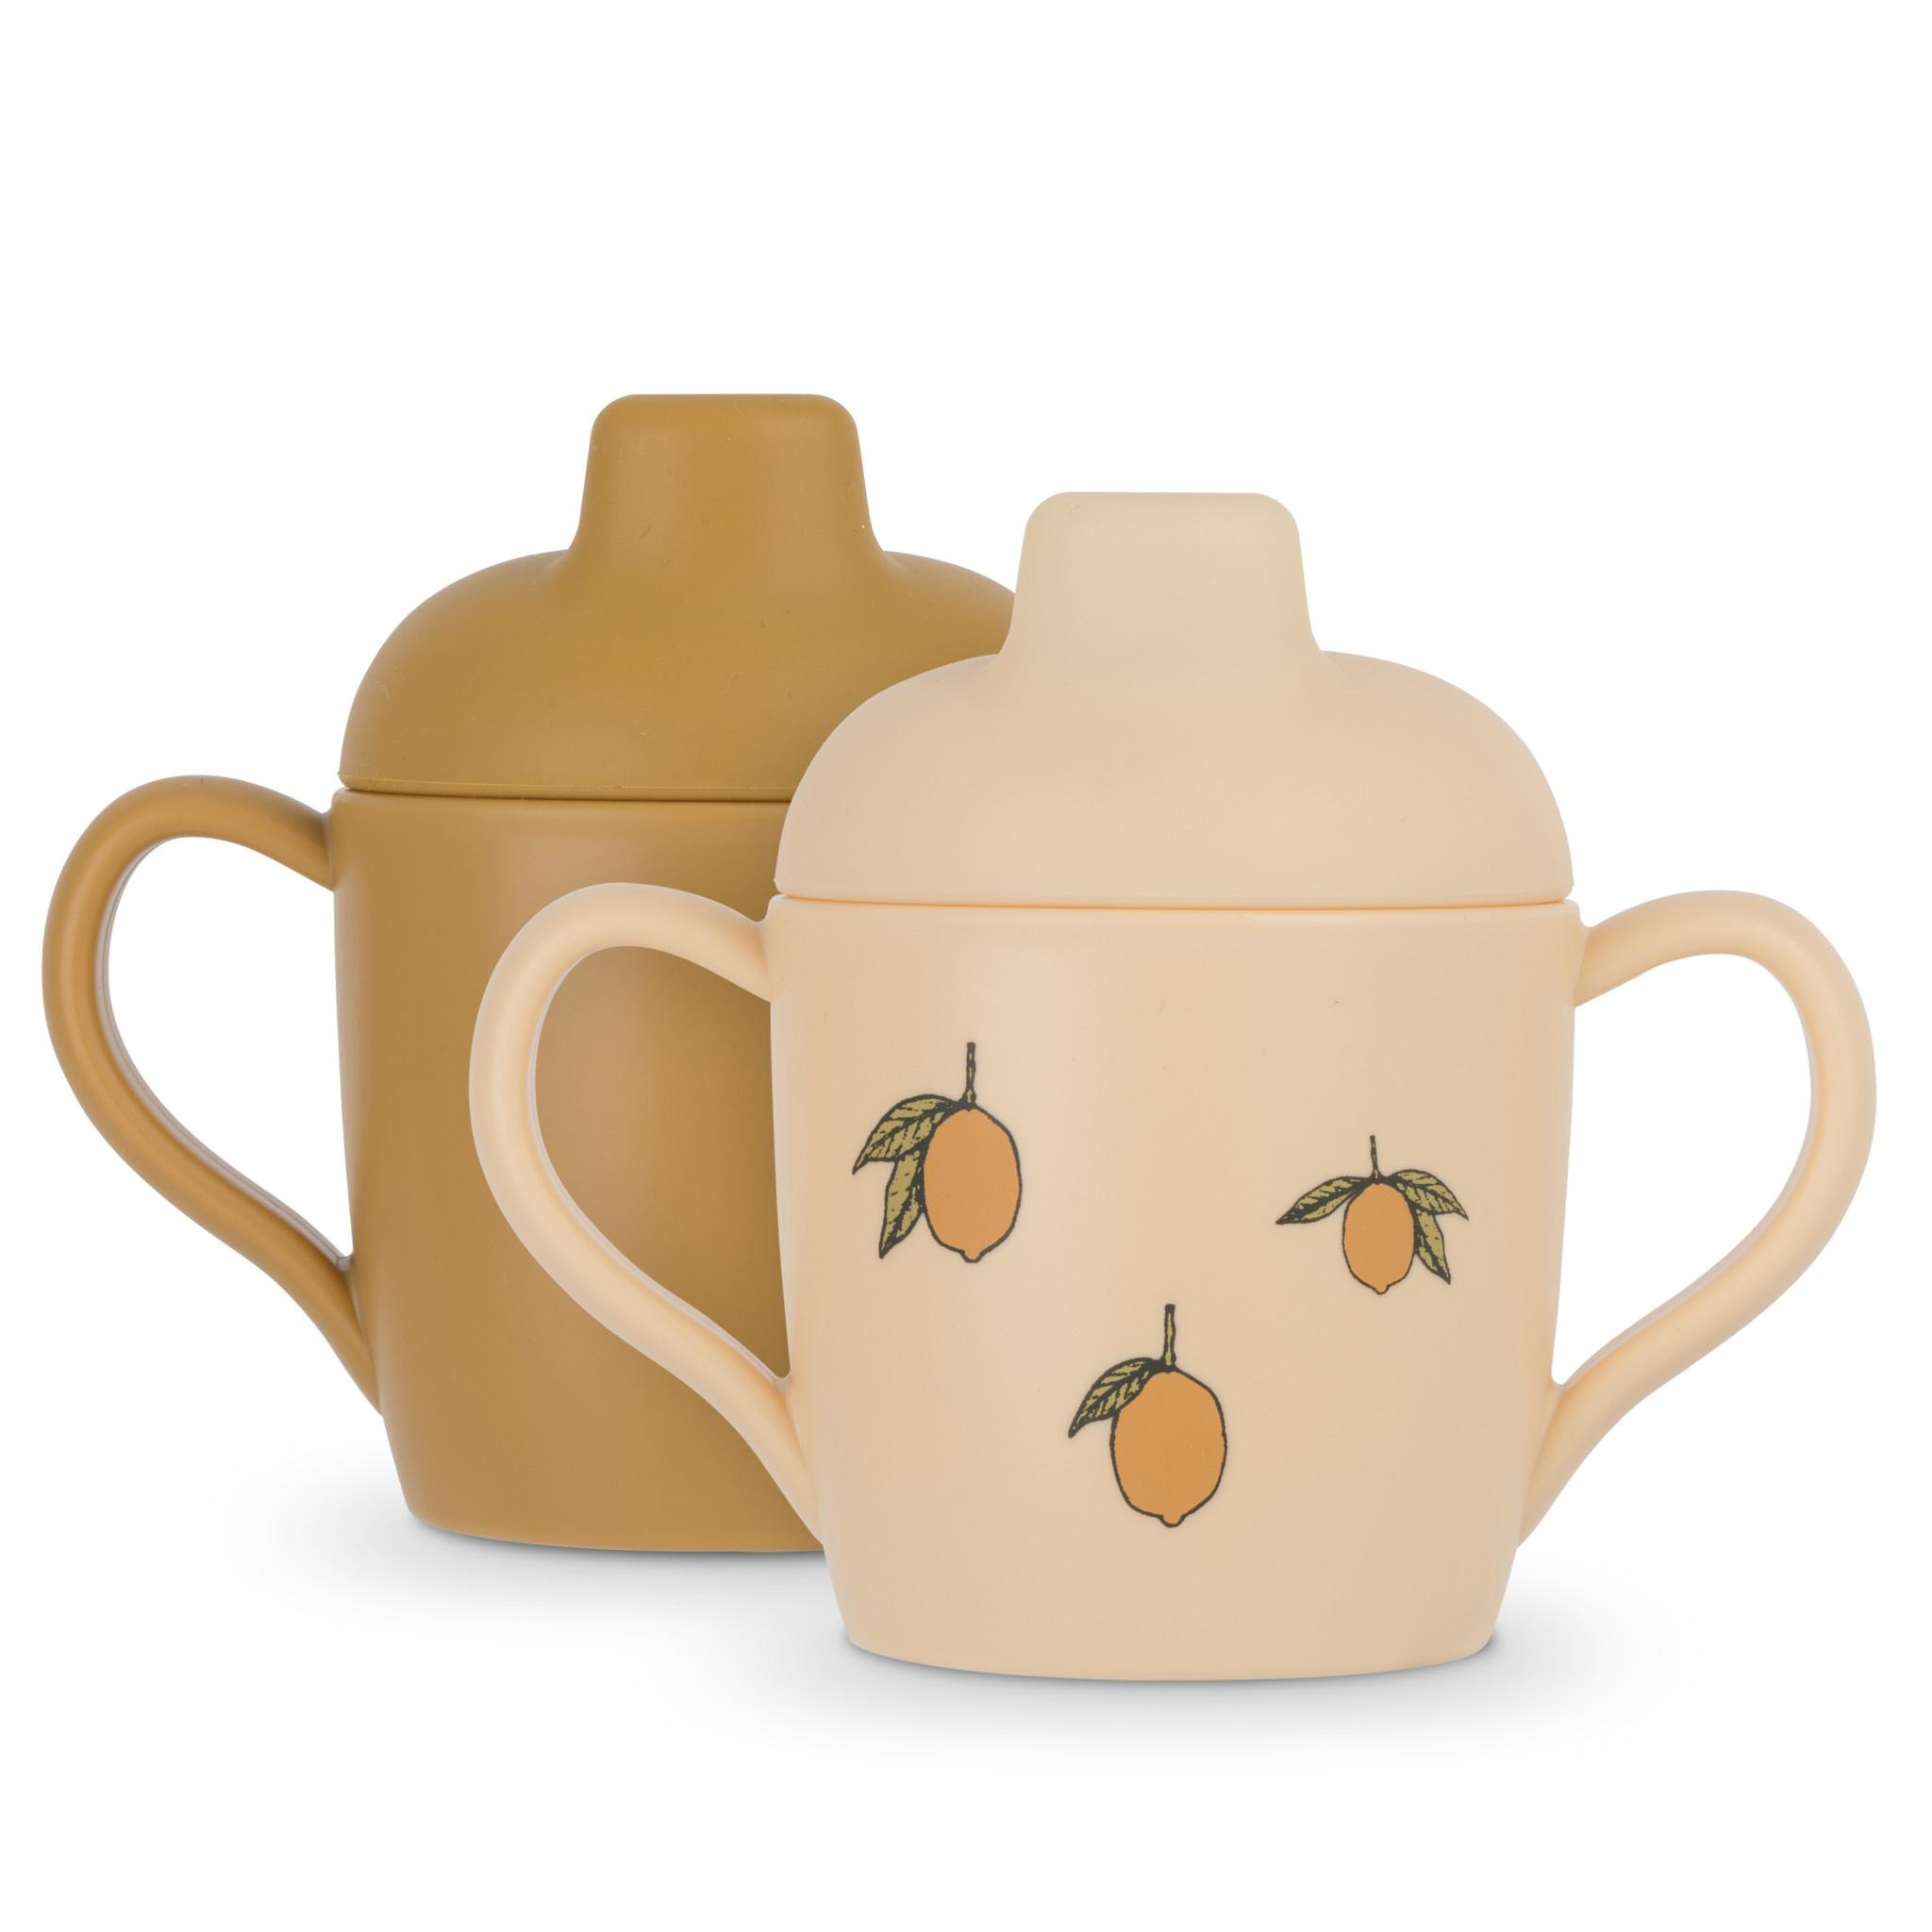 Sippy cup lemon - 2 pack-1